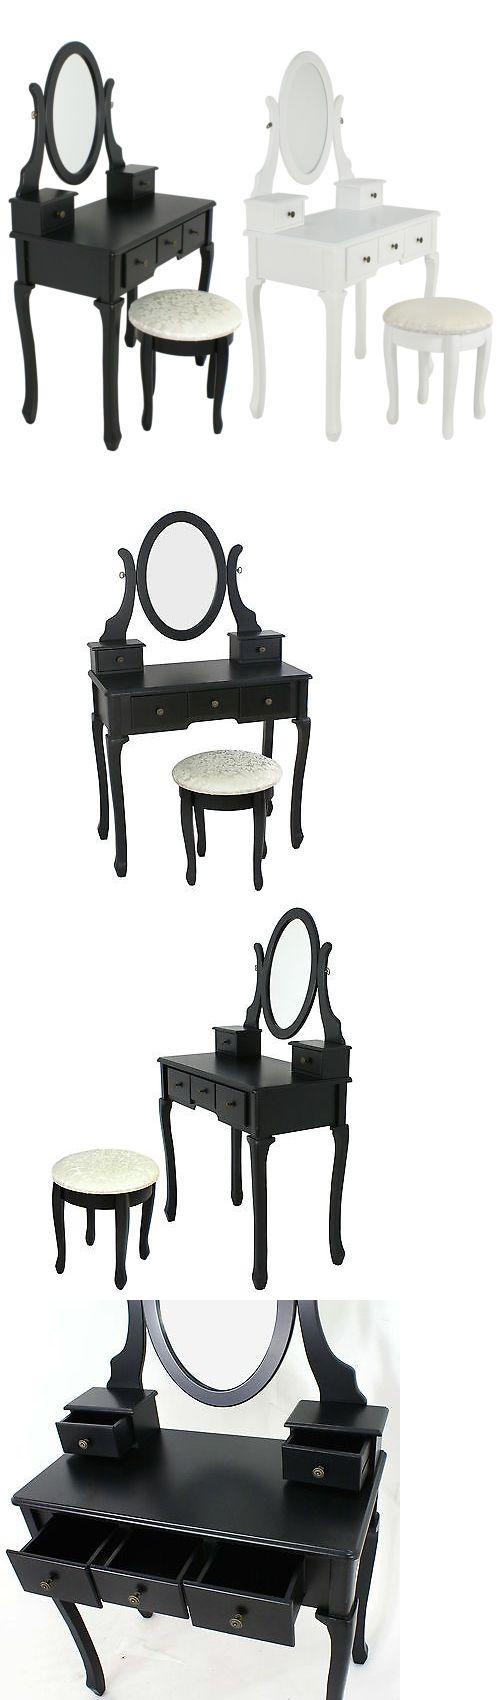 Black vanity salons vanities habitats the mirror outlets mirror - Vanities And Makeup Tables 32878 White Black Vanity Makeup Dressing Table Set Wood Desk W